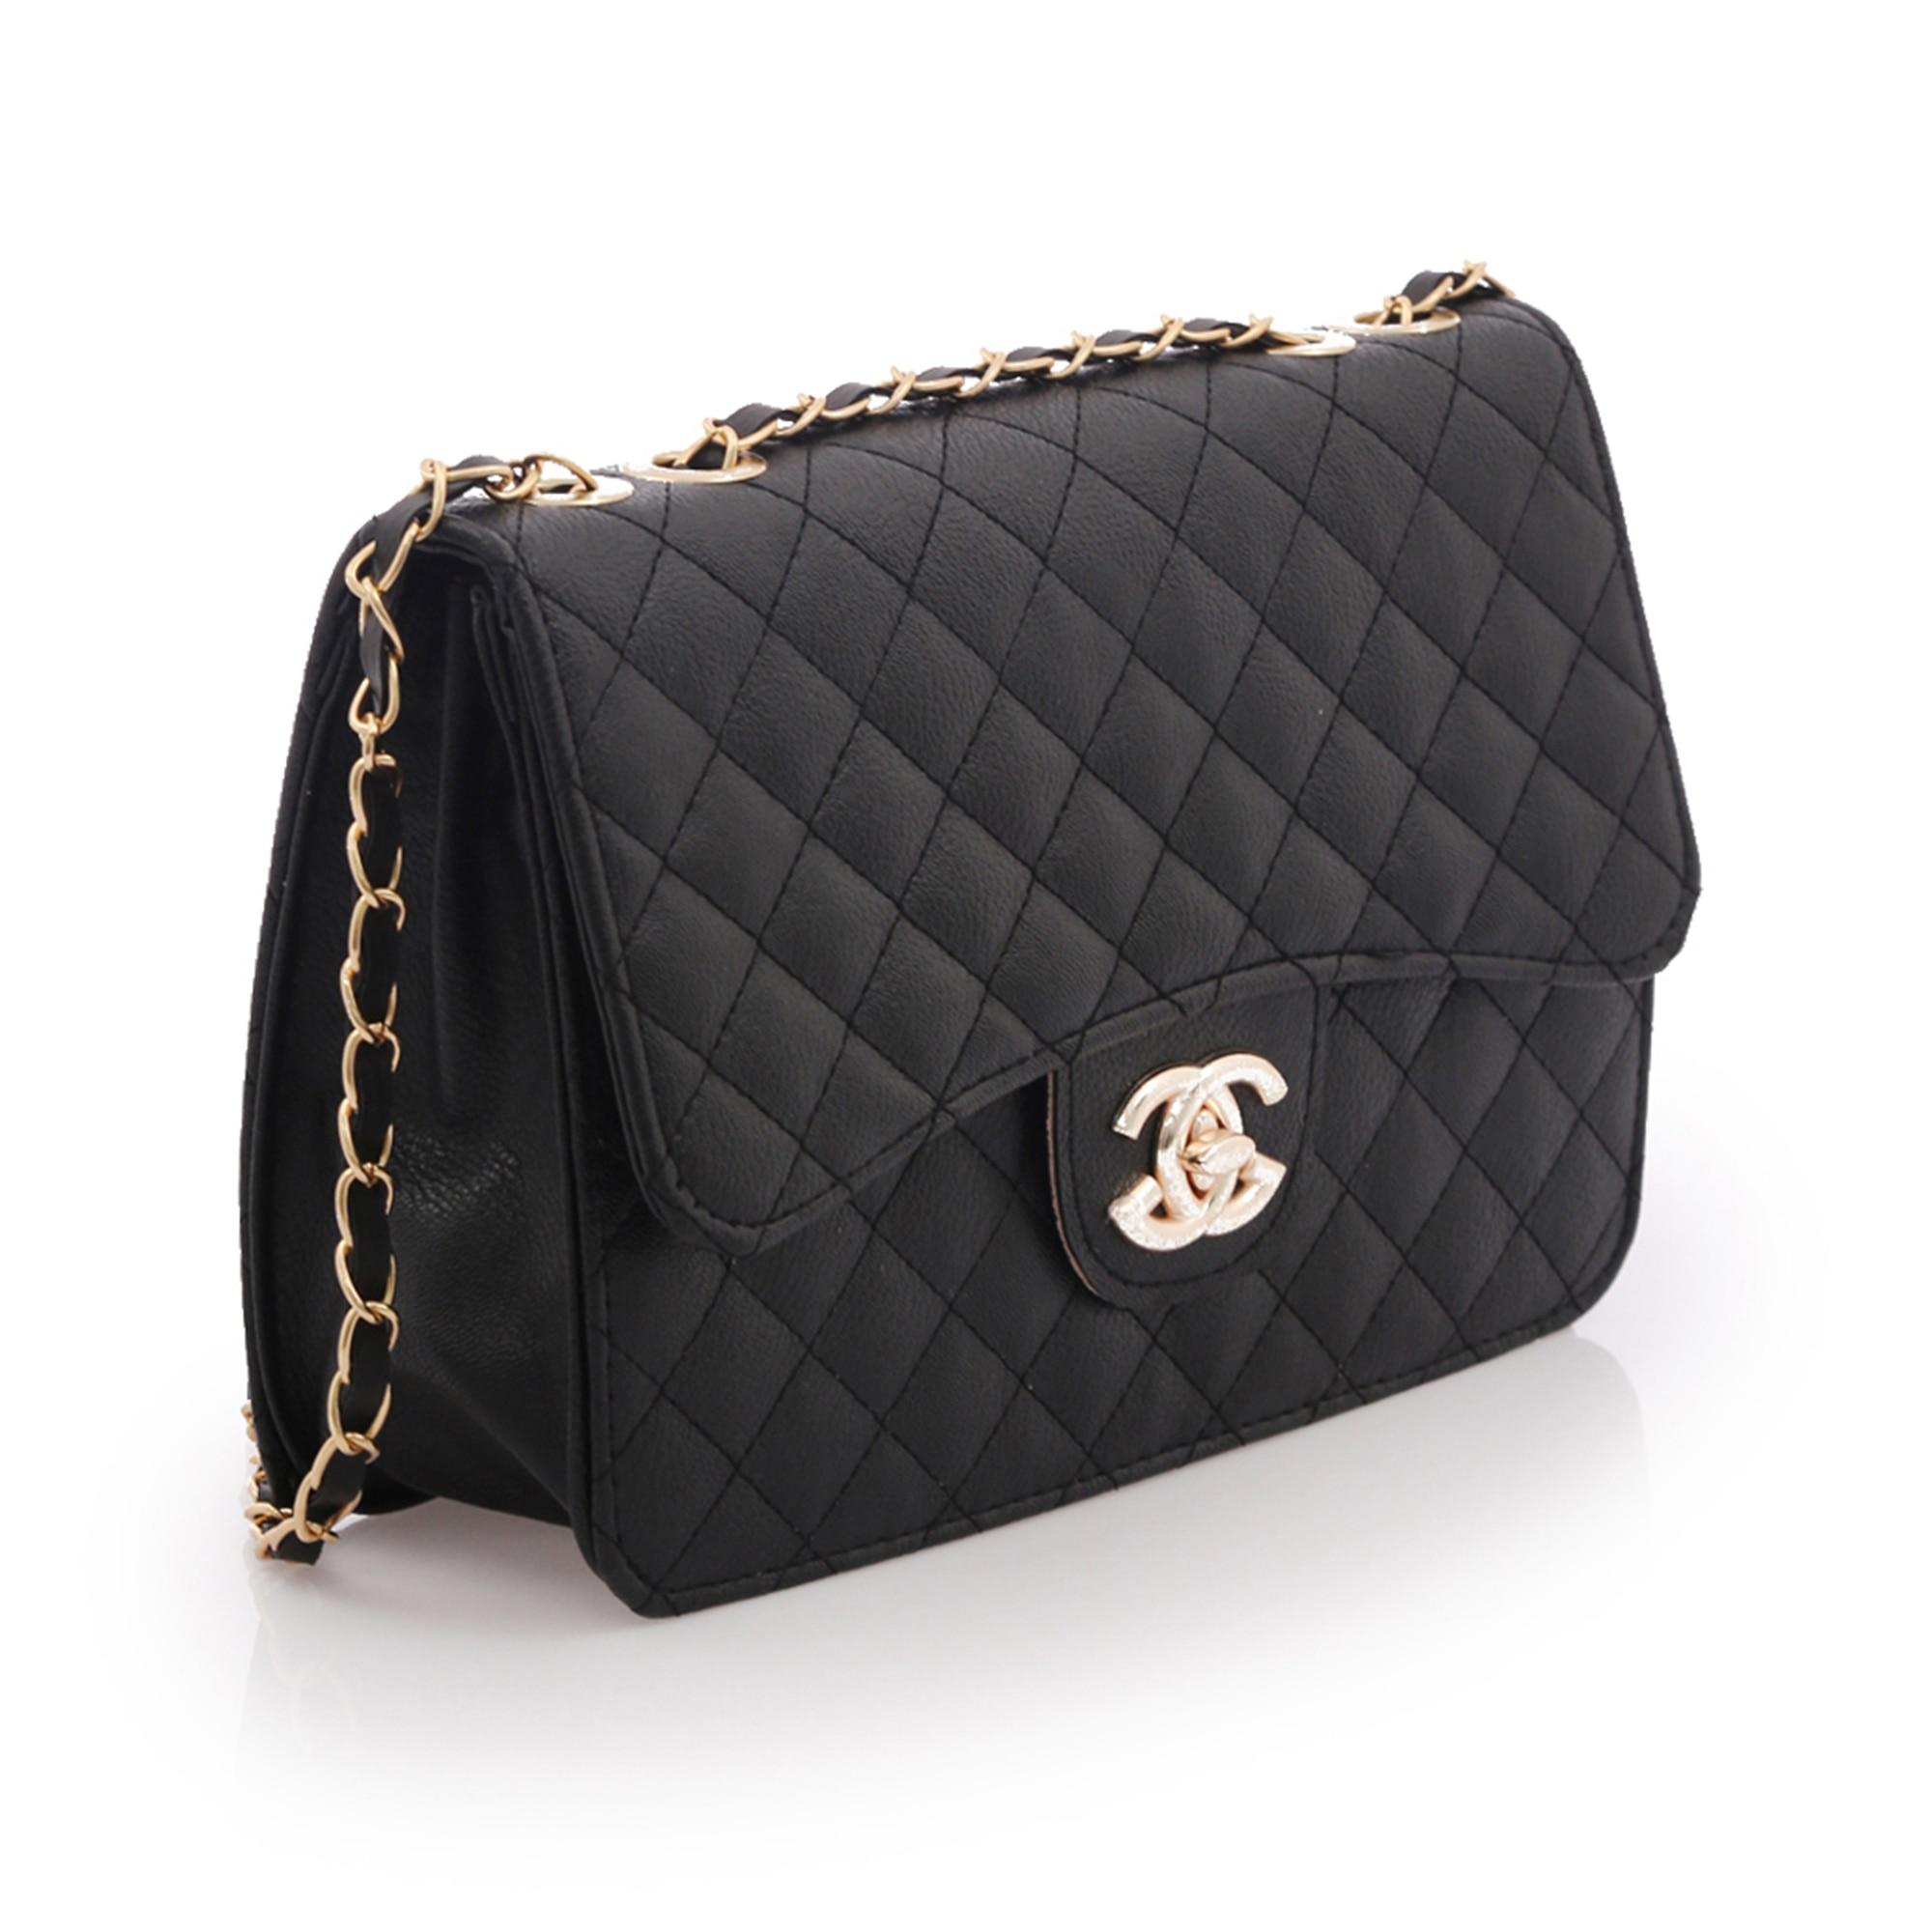 Woman Bags Black Shoulder Bag Women Handbag Crossbody Tote Lady Fashion Small Leather Hand Purse Des